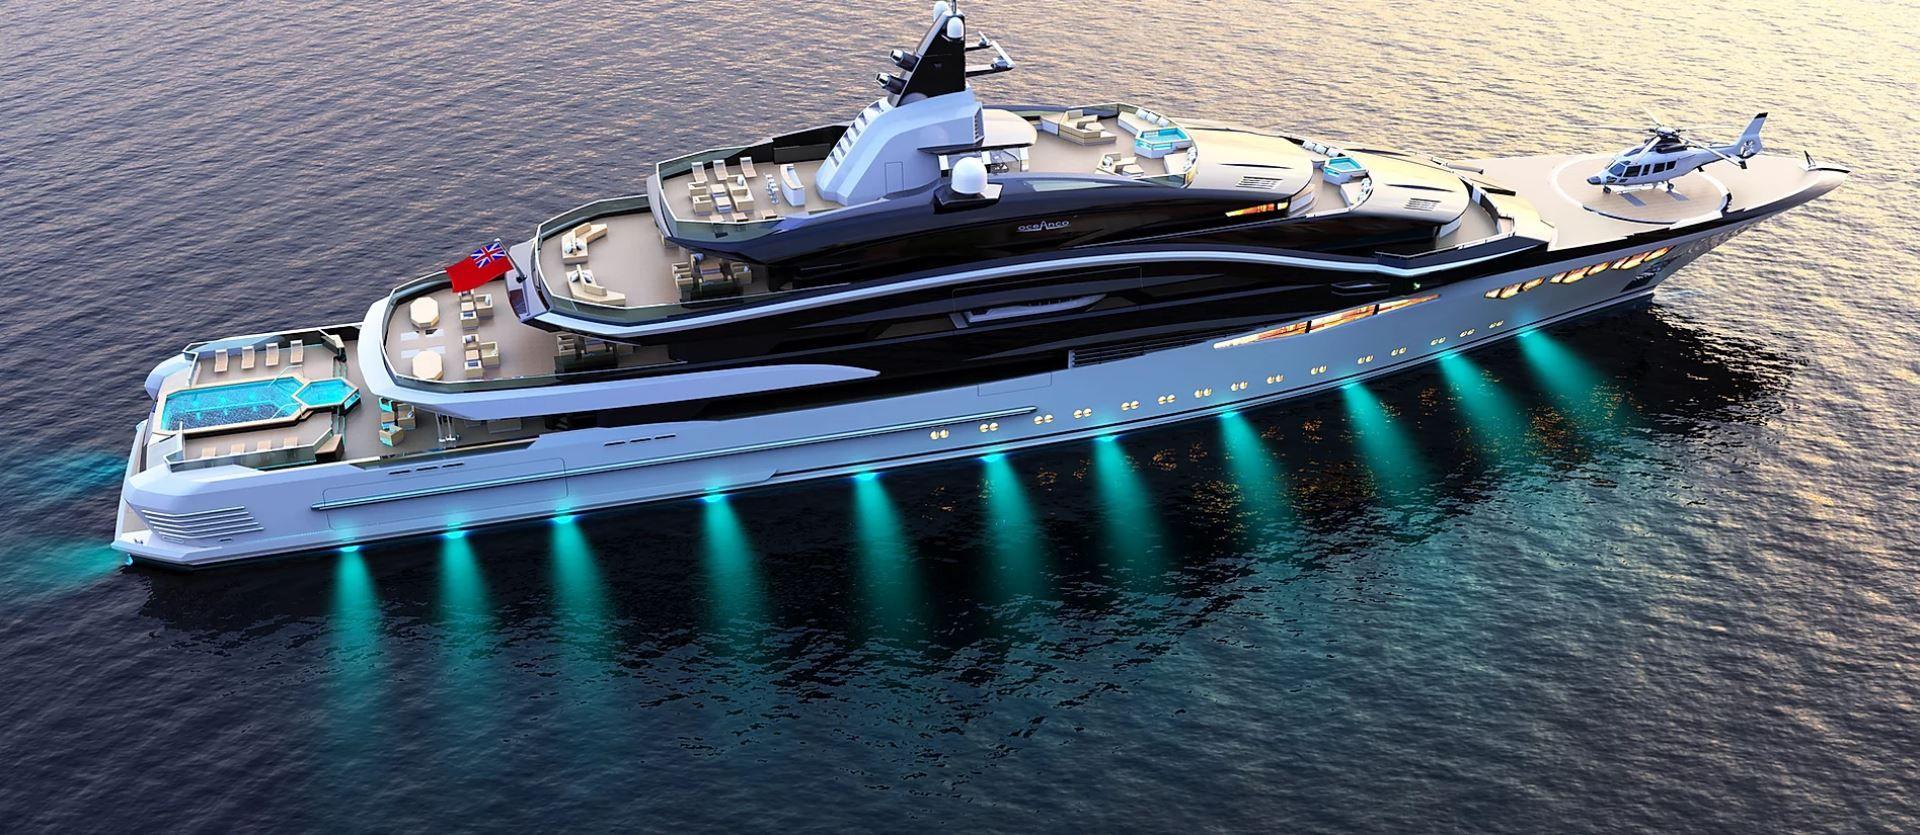 yacht, yacht concept, luxury yacht